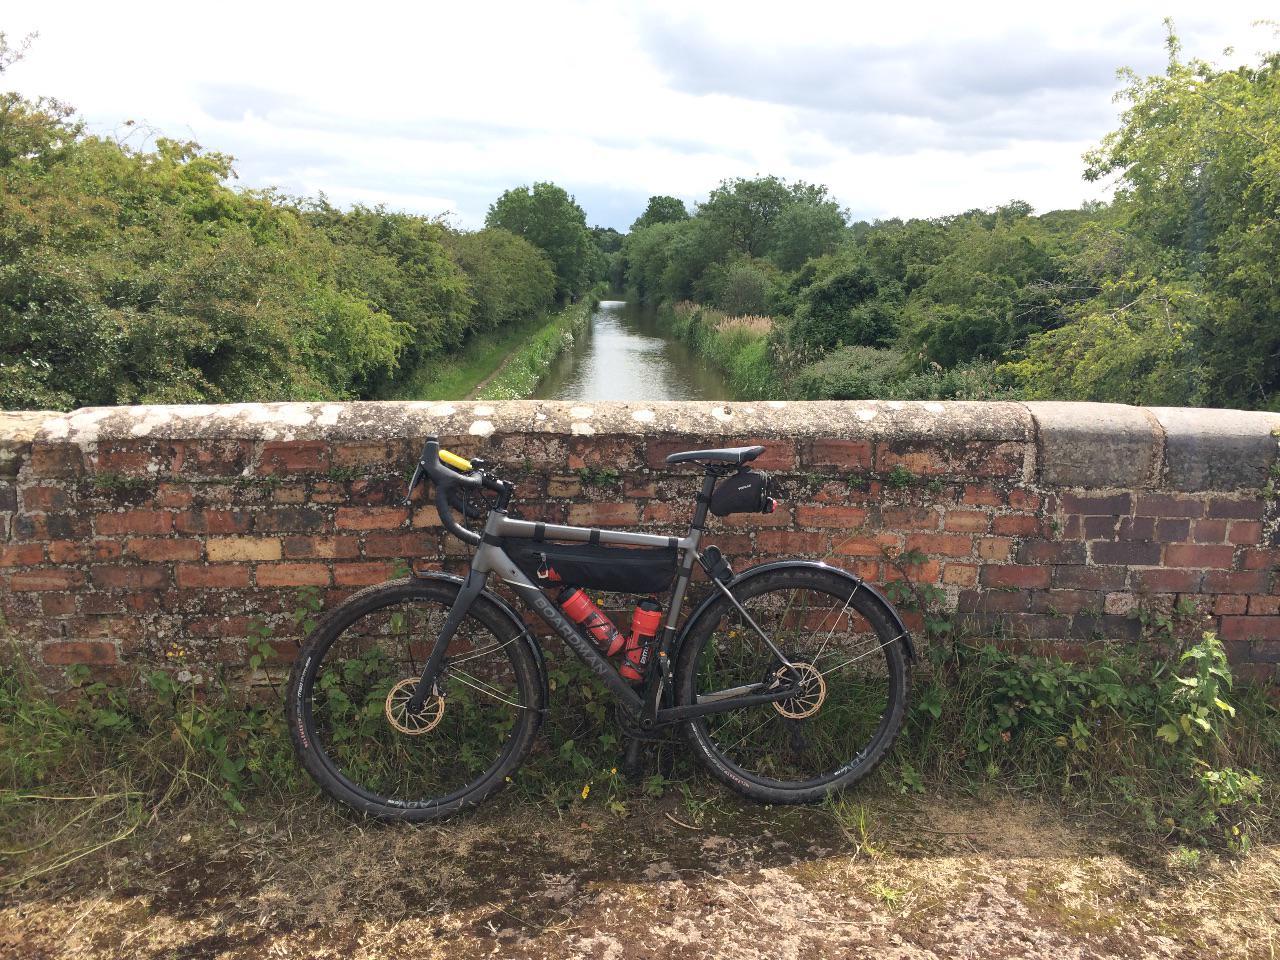 A gravel bike on a canal bridge